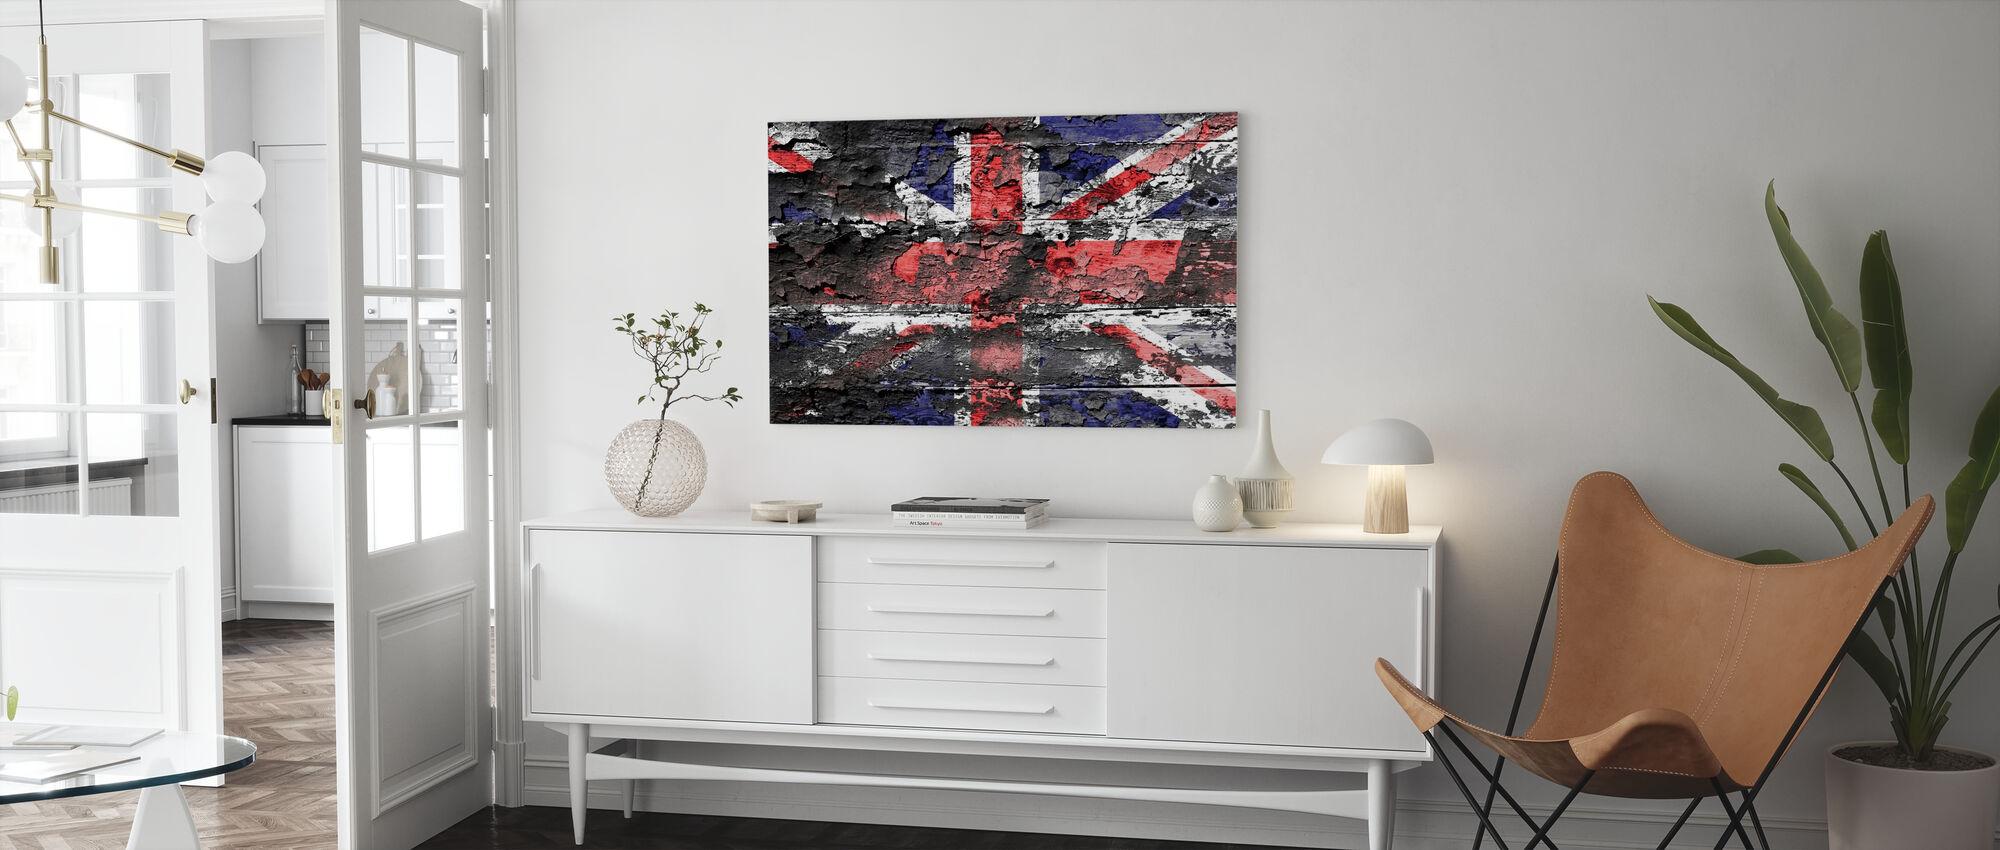 Groot-Britannië Vlag - Canvas print - Woonkamer